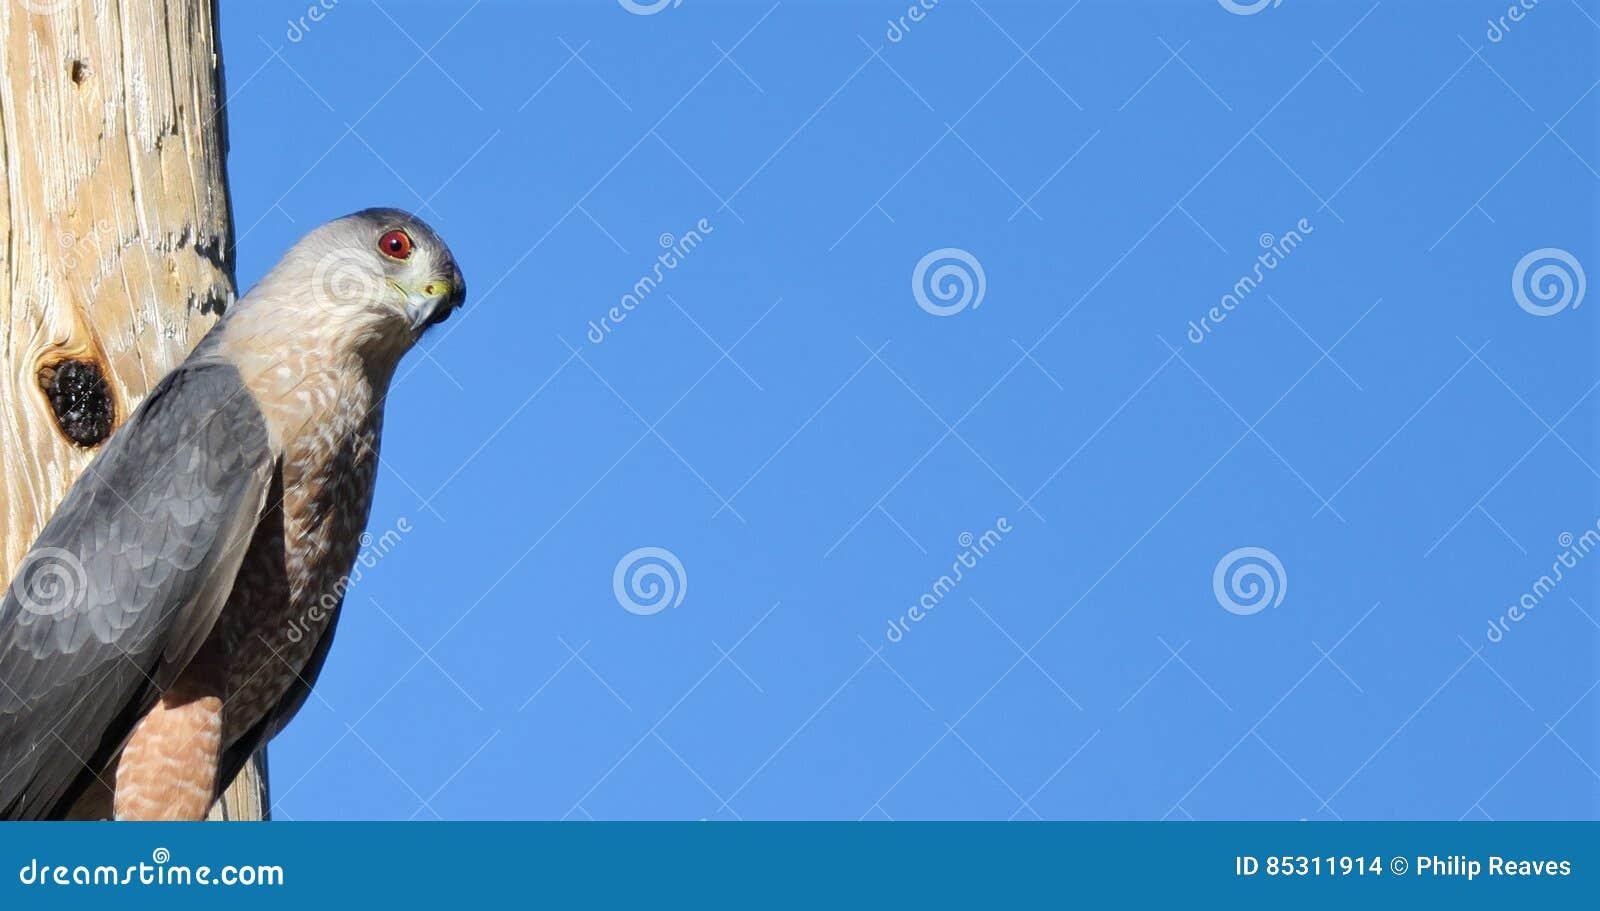 A Falcon Looking At The Camera Stock Photo